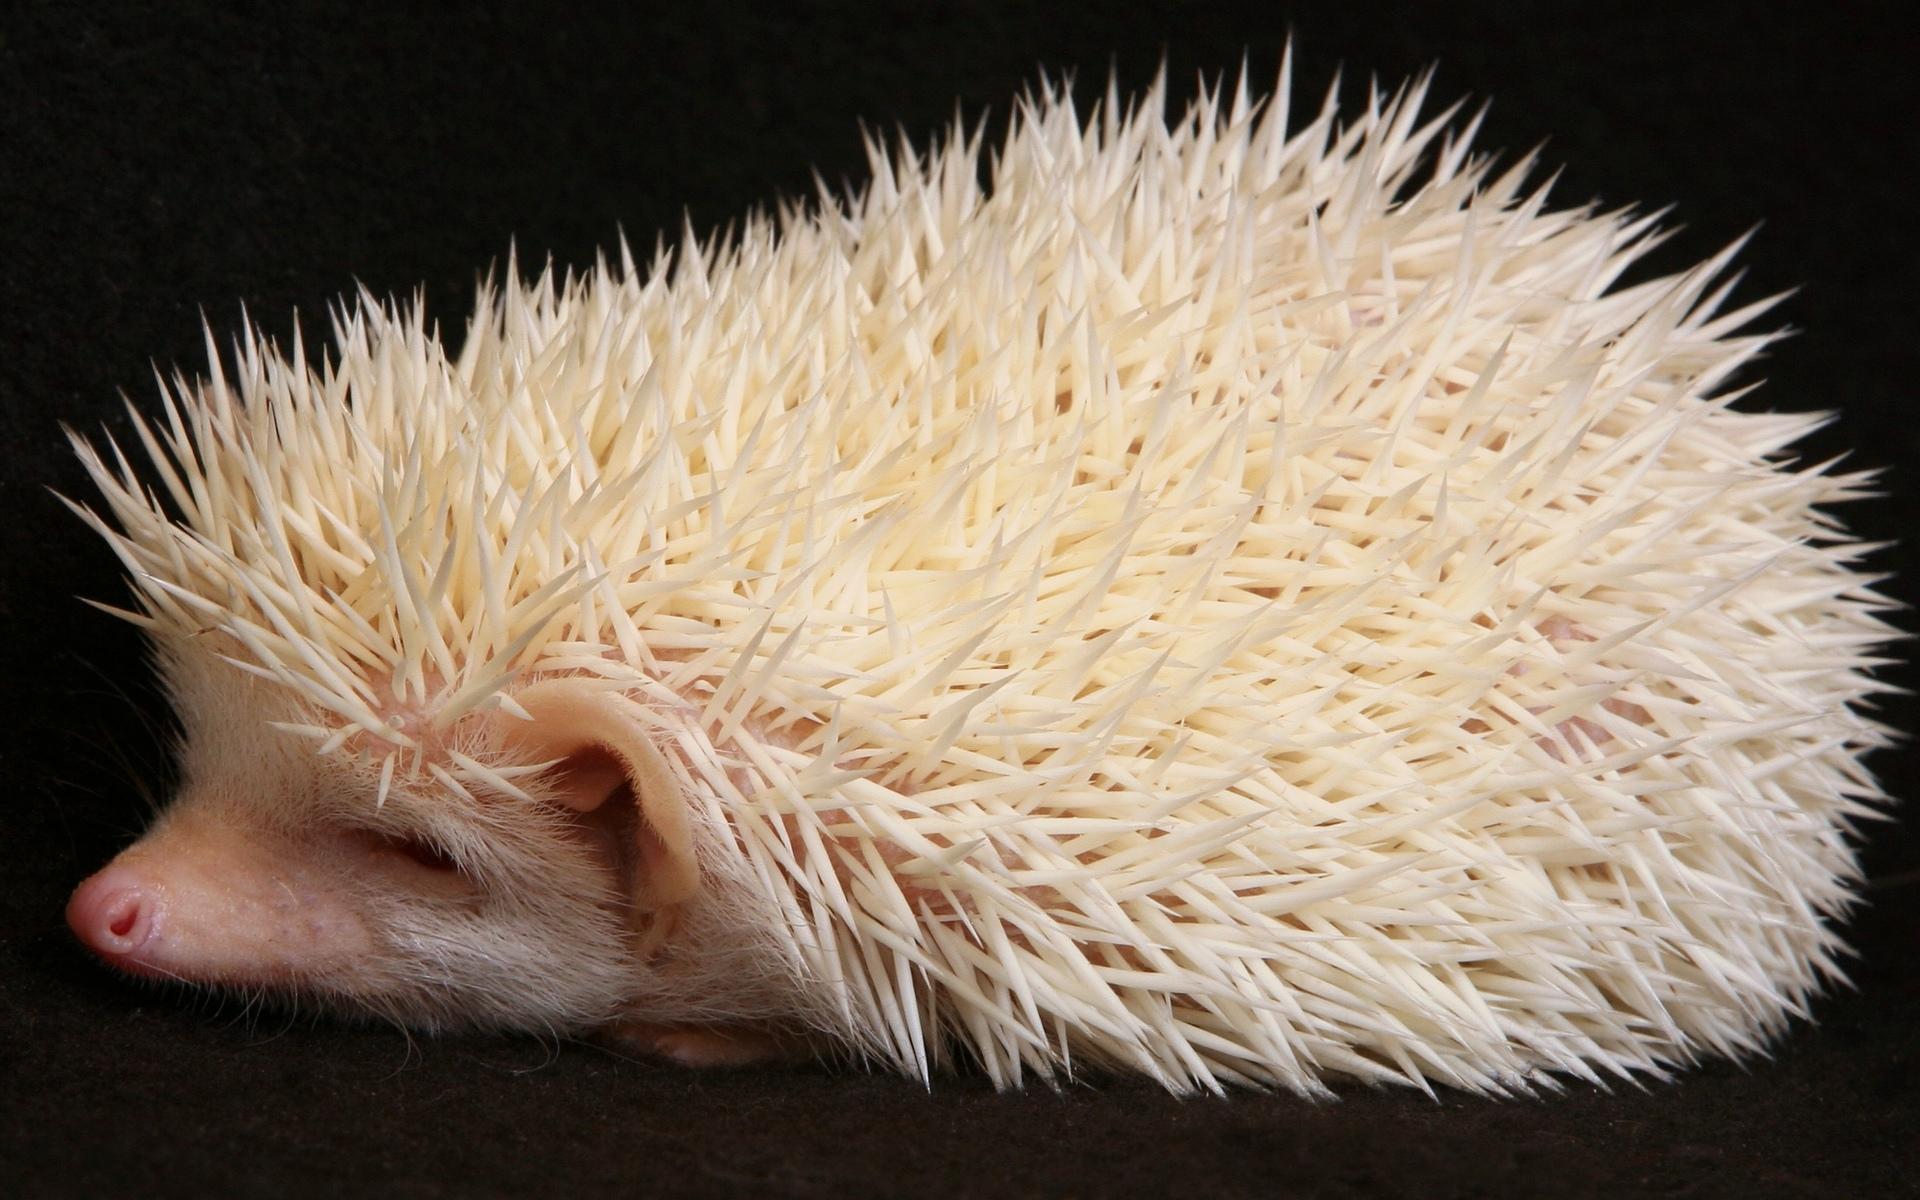 African Pygmy Hedgehog Albino wallpaper - 86052